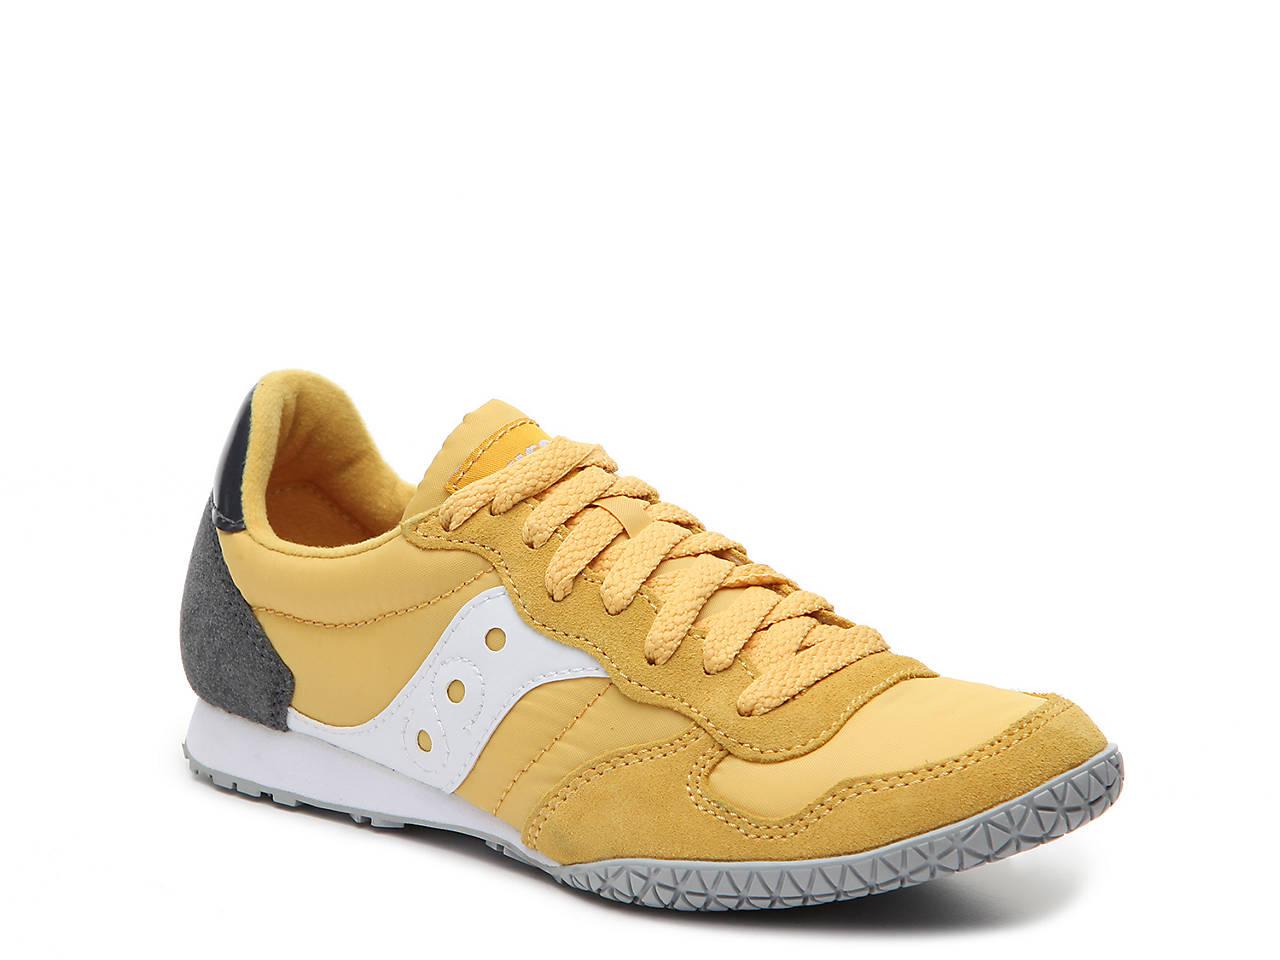 eb5e7e7a0587 Saucony Bullet Sneaker - Women s Women s Shoes